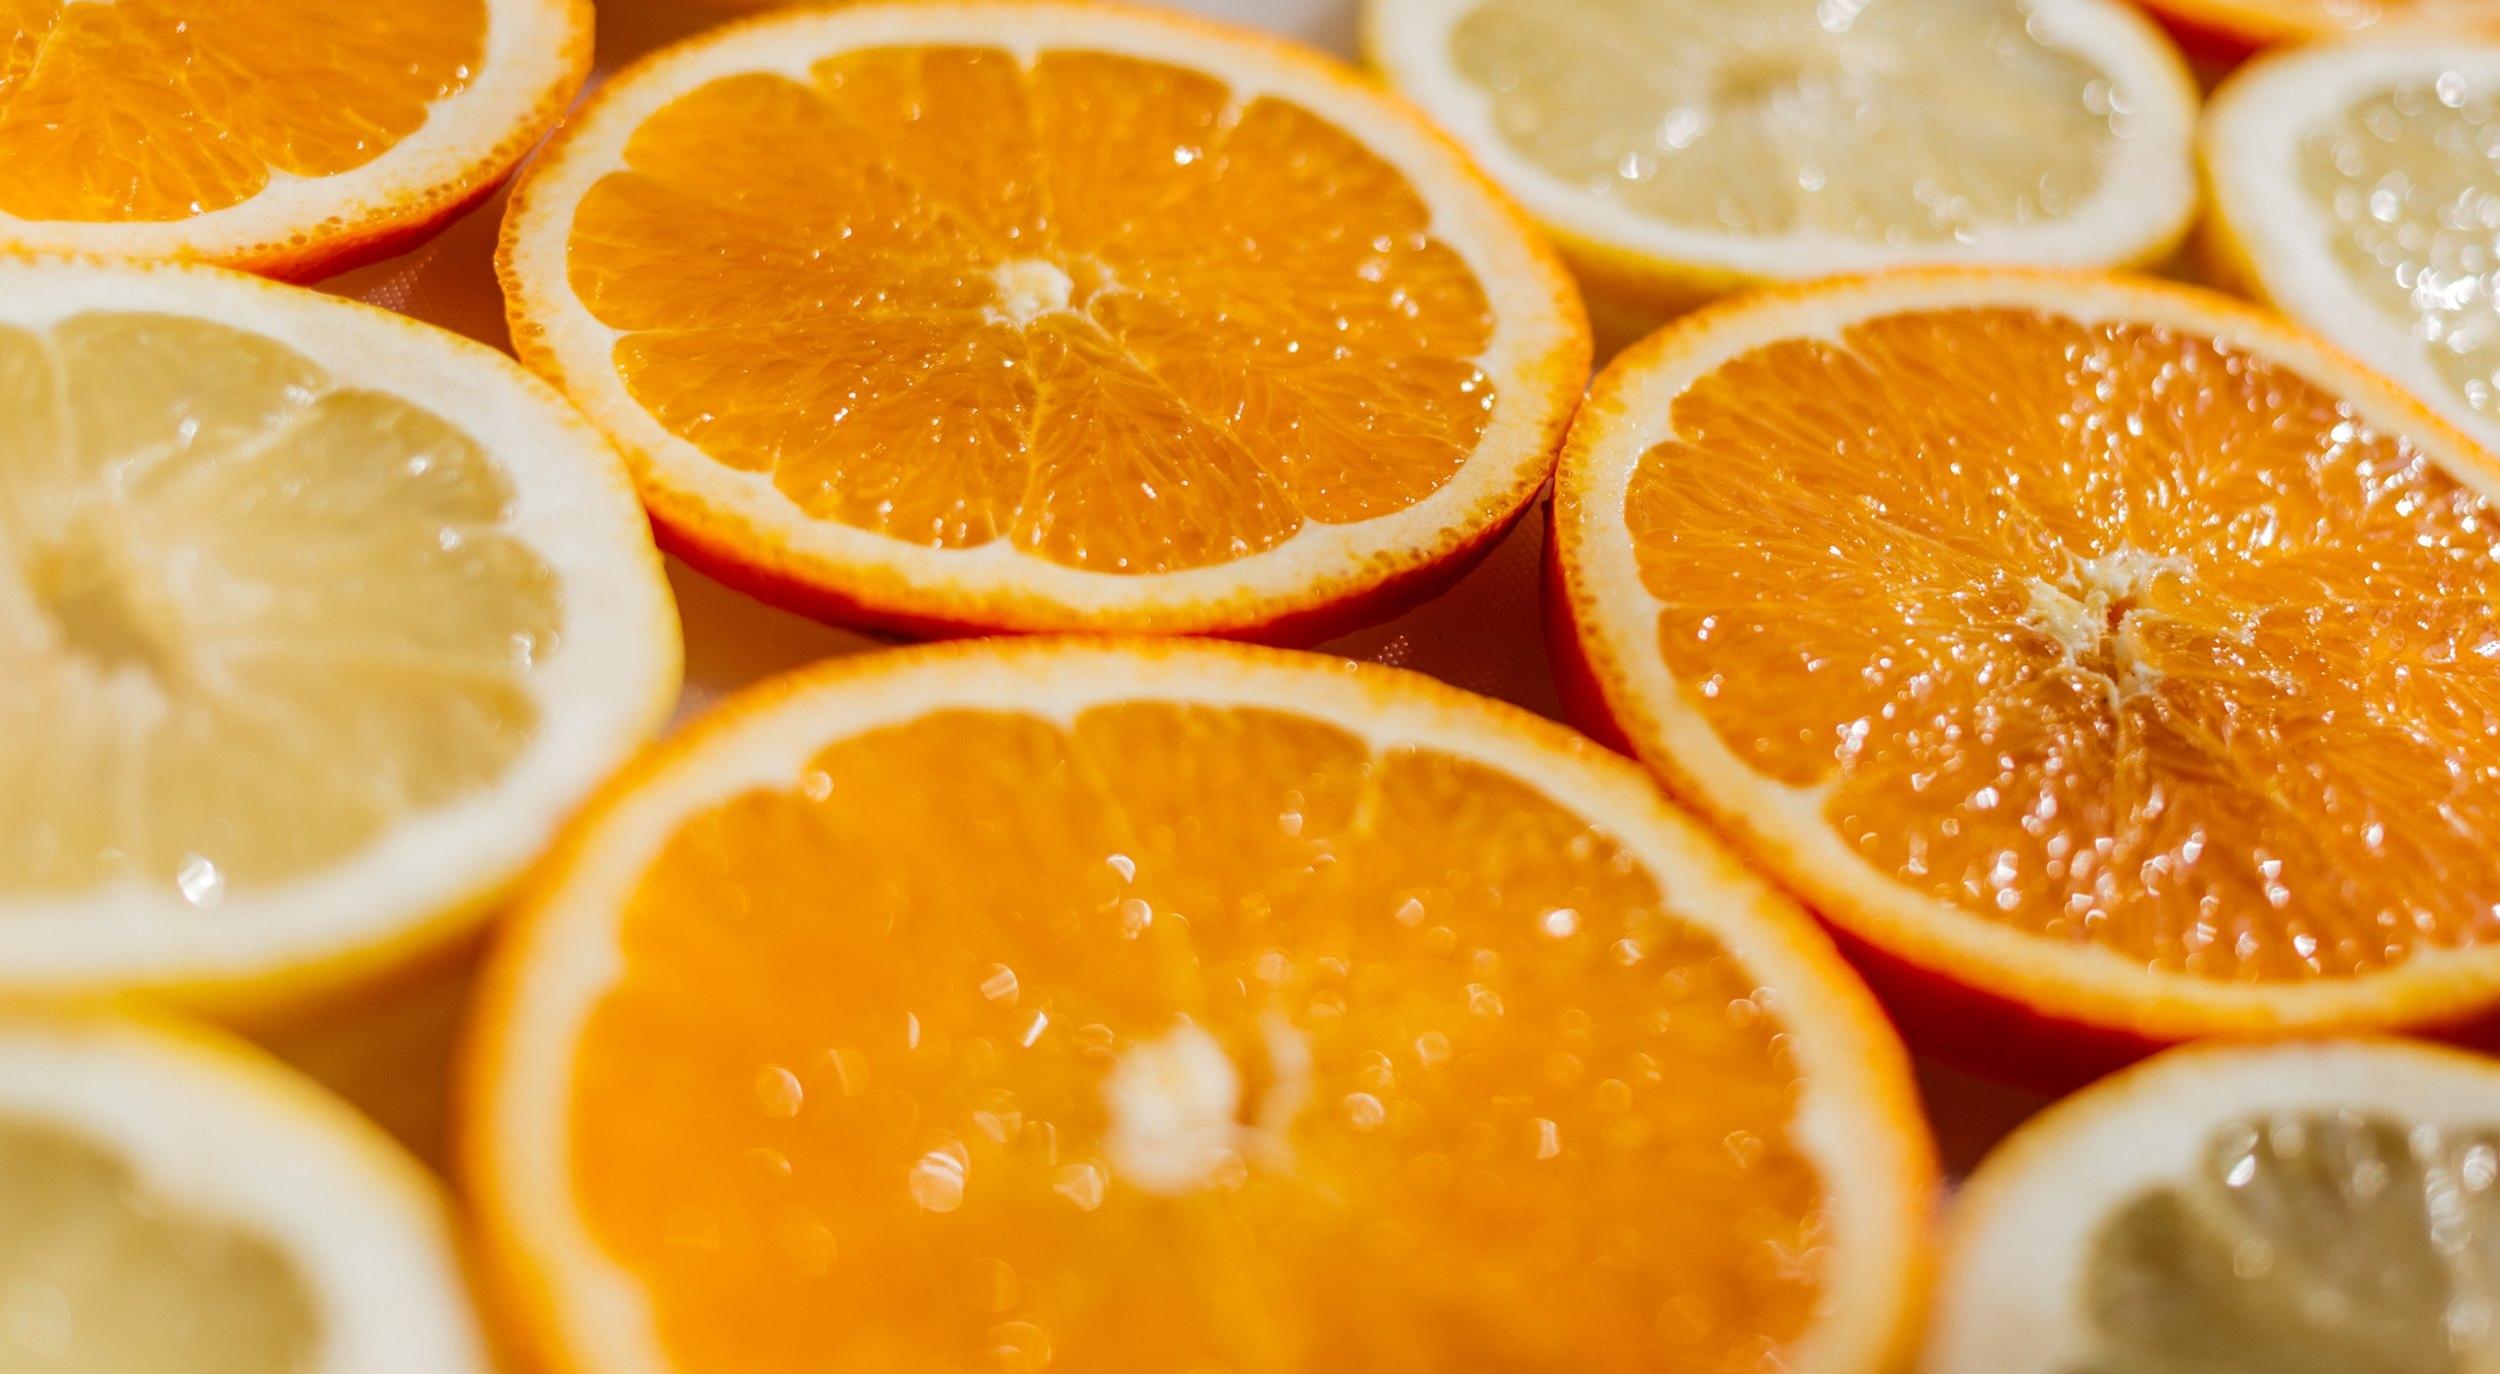 vitamin-c-shot-sherman-oaks-california